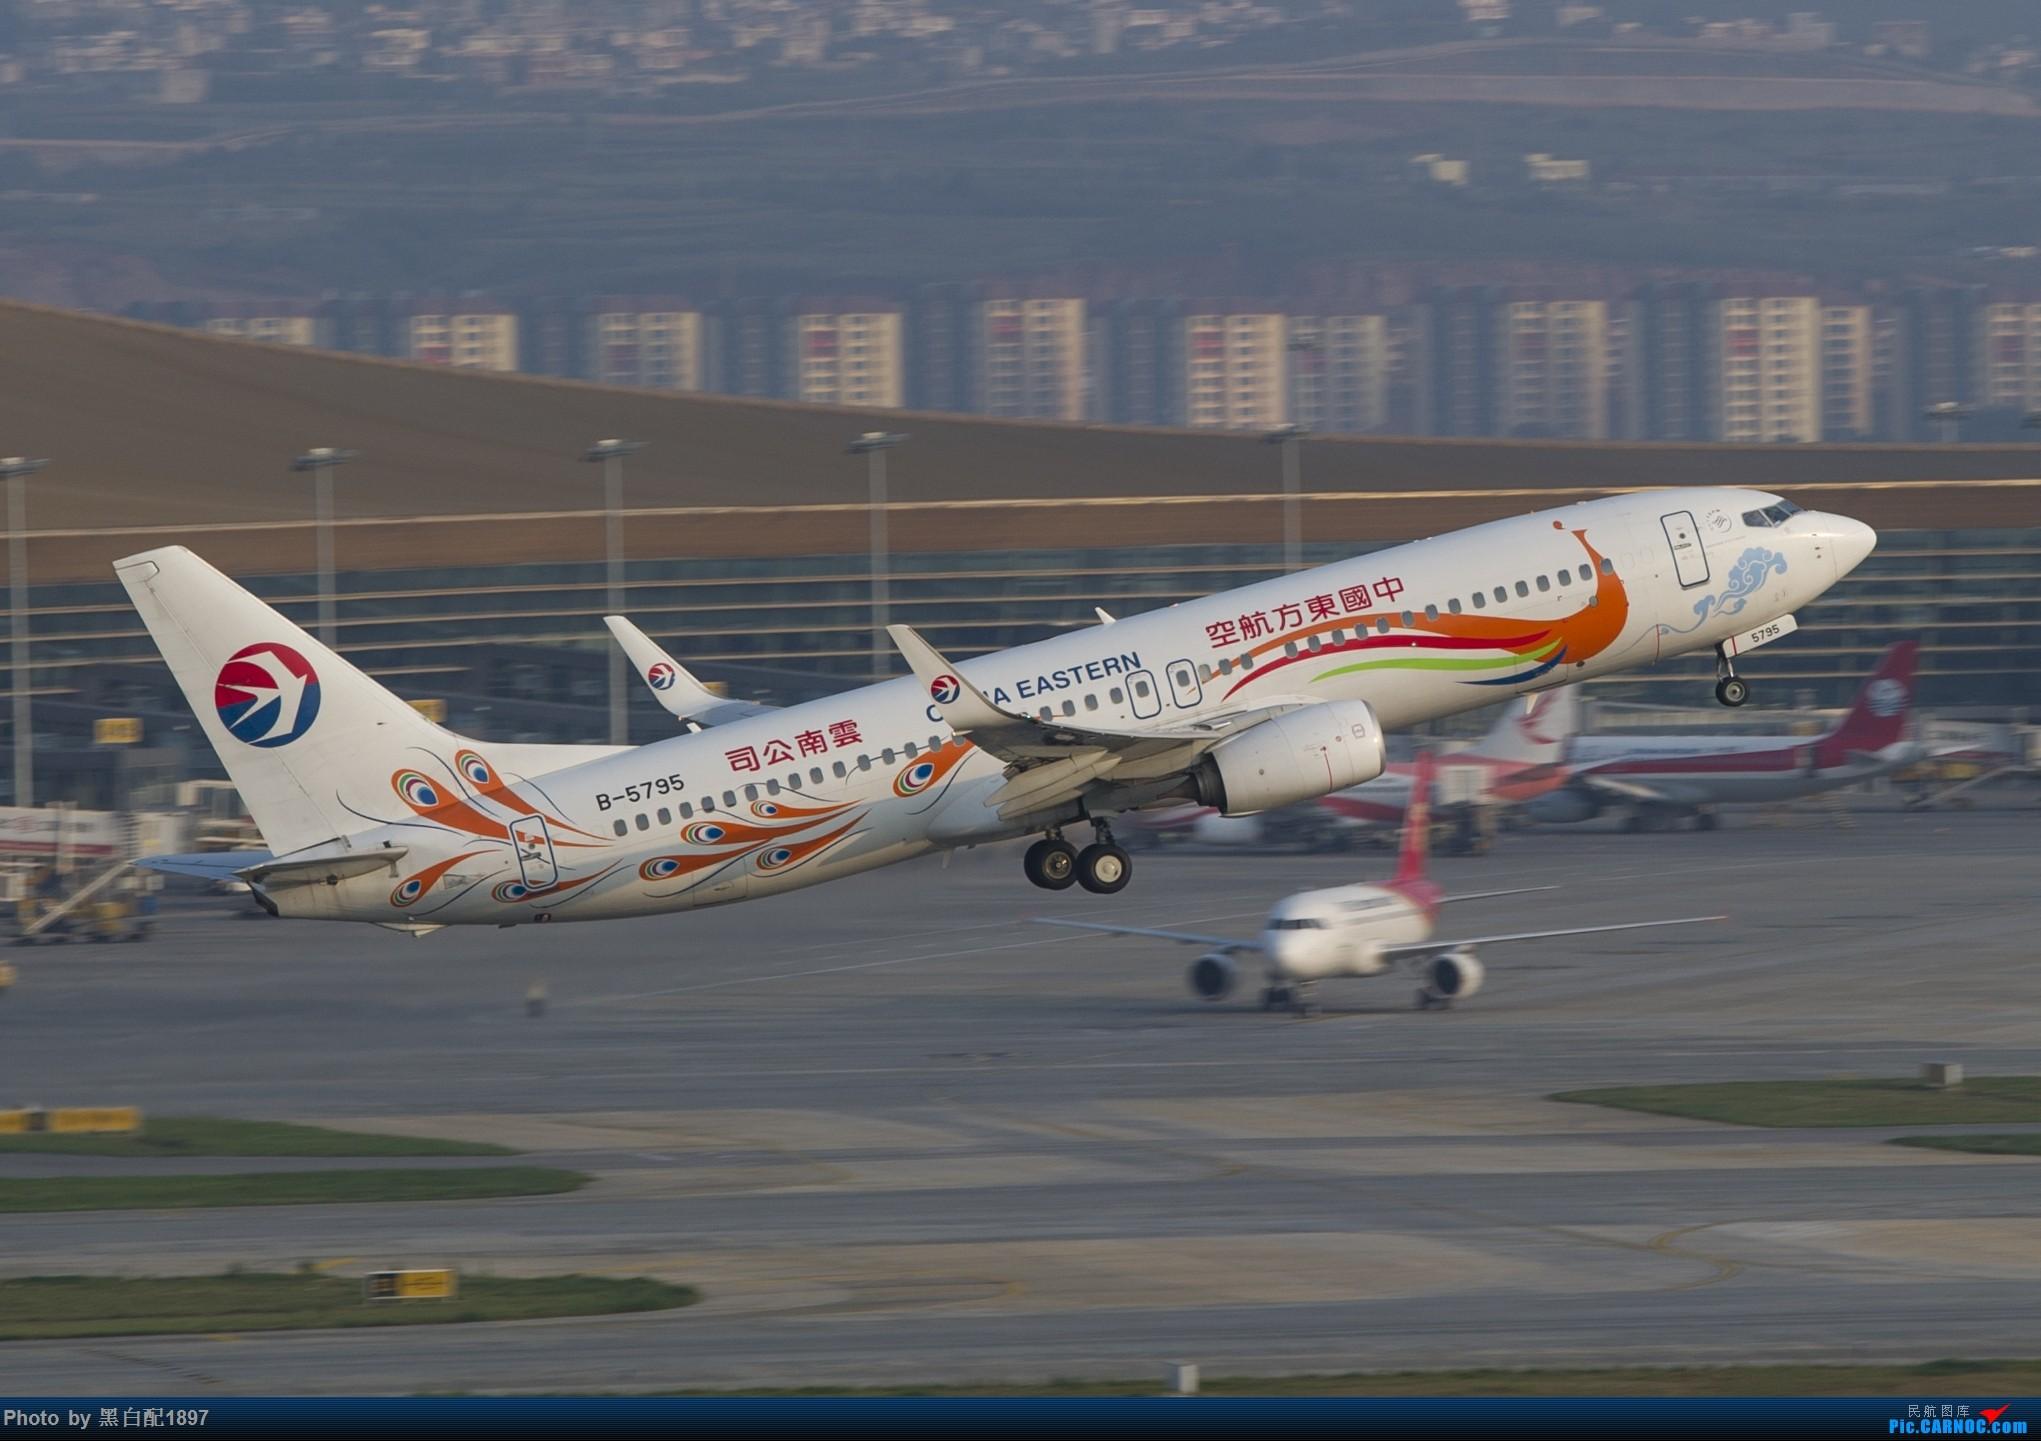 Re:[原创]国庆长水二日游之一 BOEING 737-800 B-5795 中国昆明长水国际机场